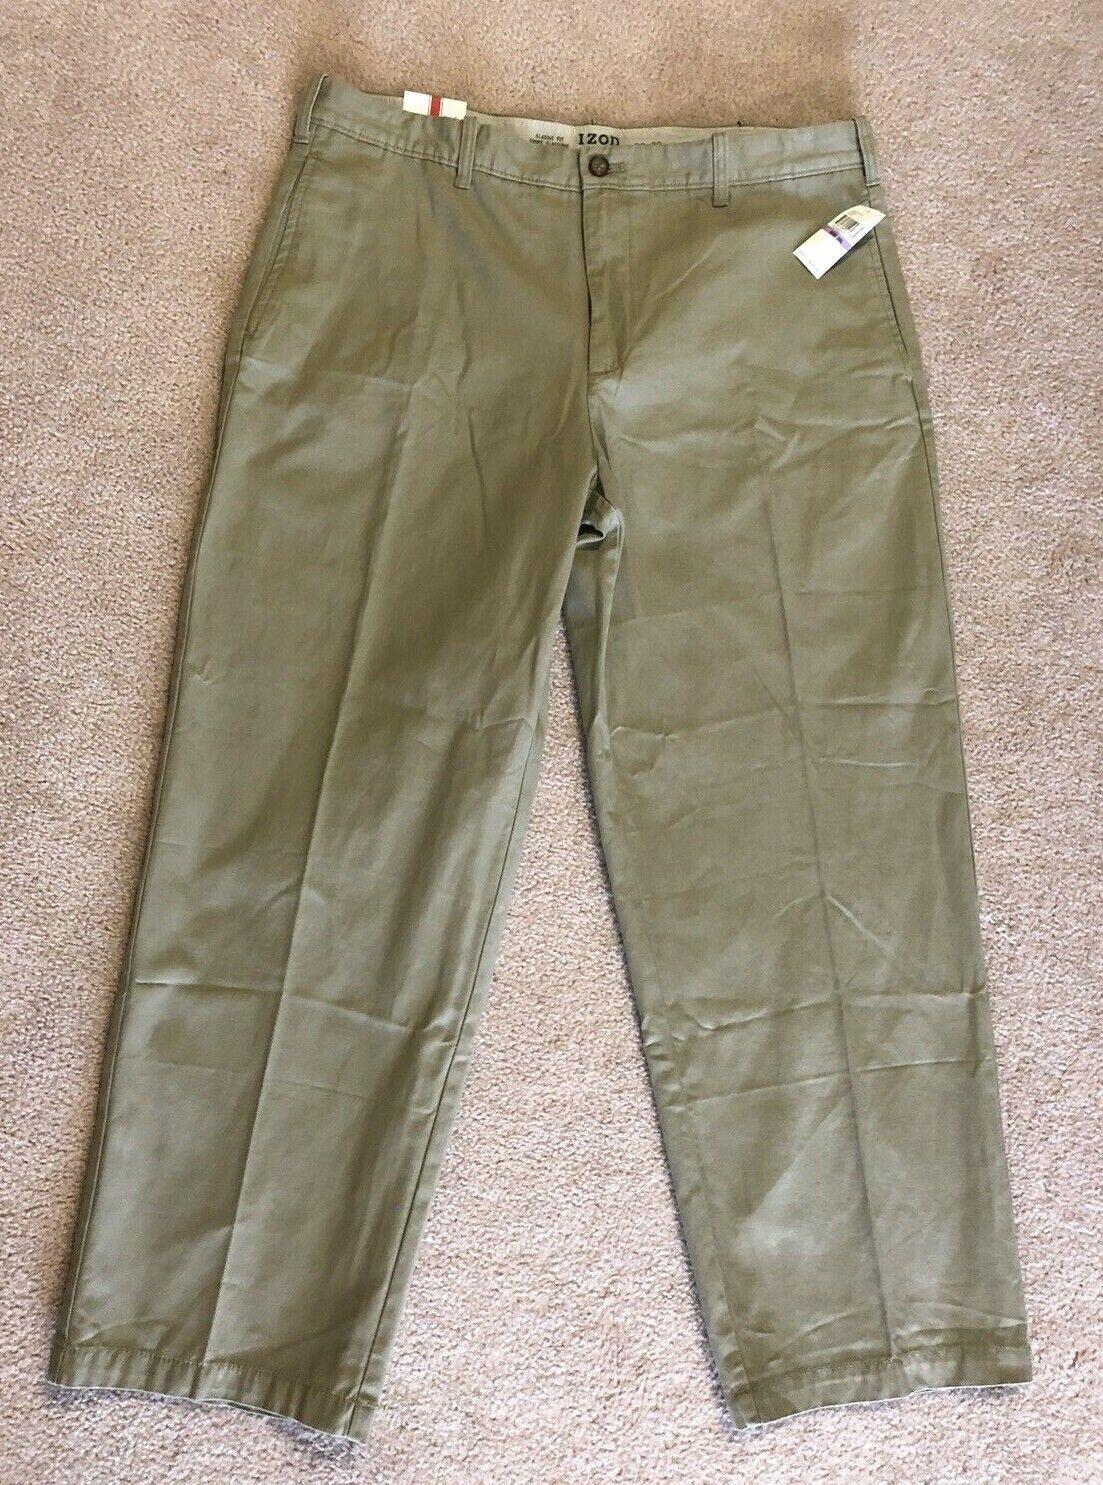 Izod Saltwater Khaki Beige Classic Fit Pants Men's Size 38W x 30L NEW with tag